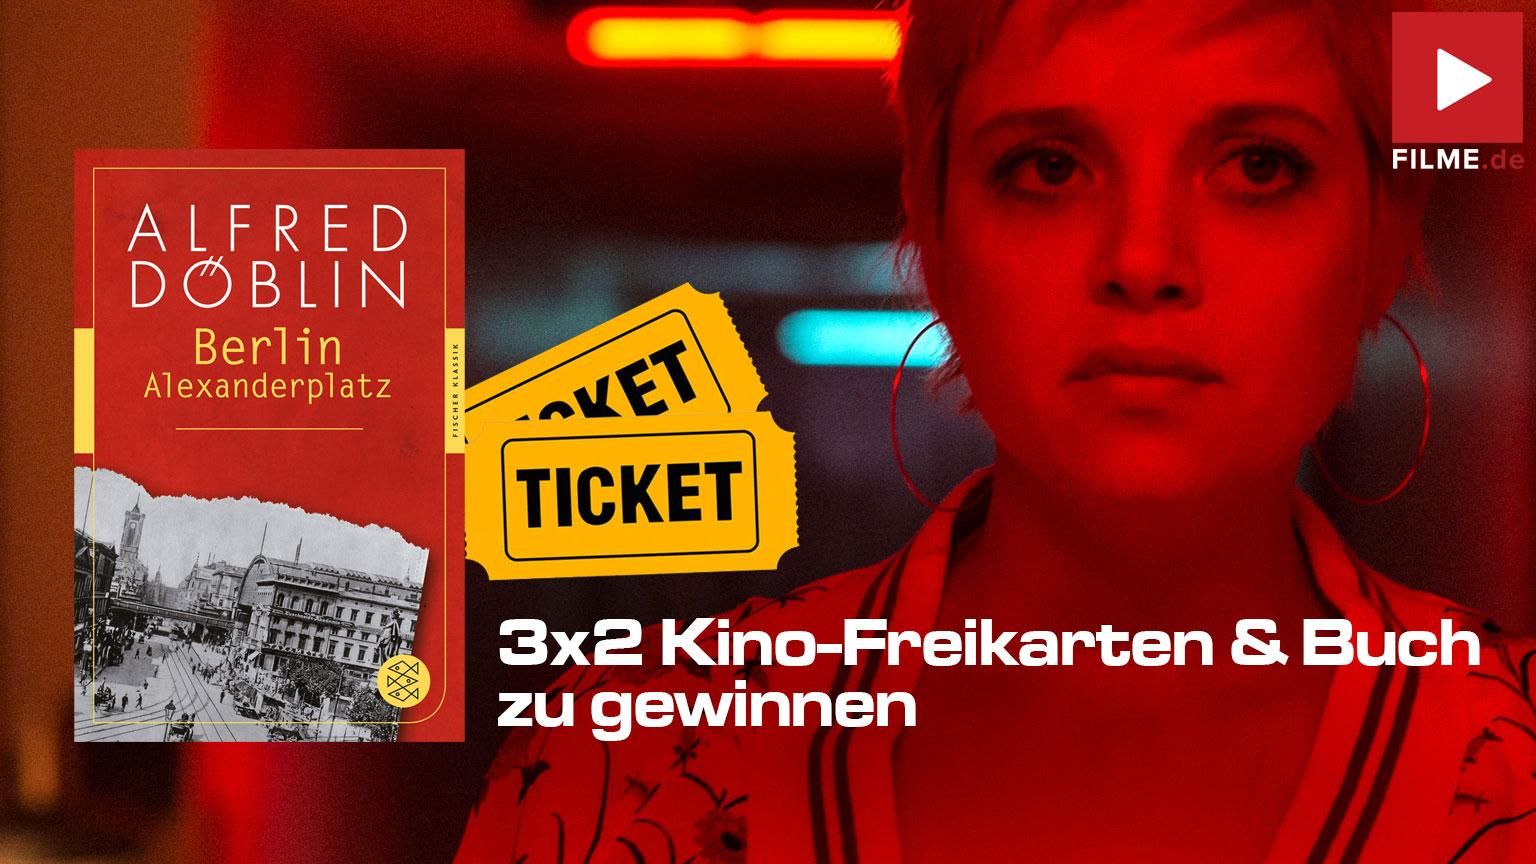 Berlin Alexanderplatz Film 2020 Kino Freikarten Gewinnspiel Artikelbild